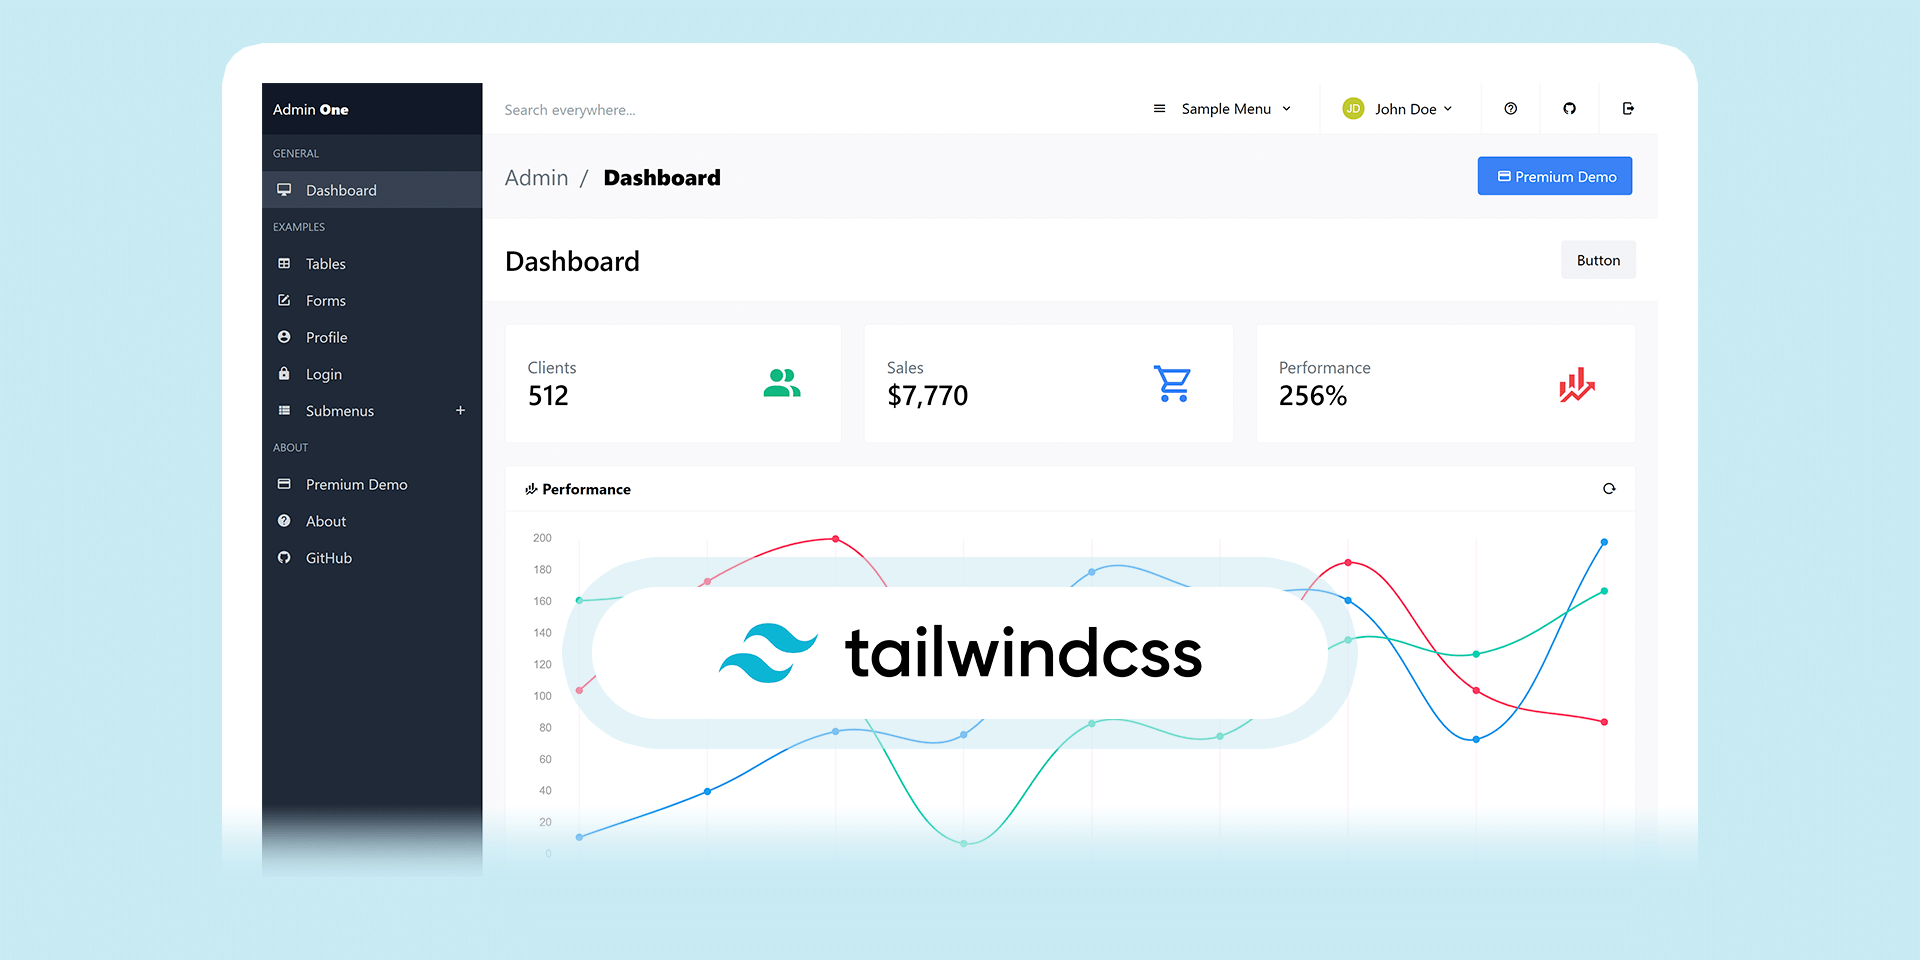 Admin One - Free Tailwind Admin Dashboard